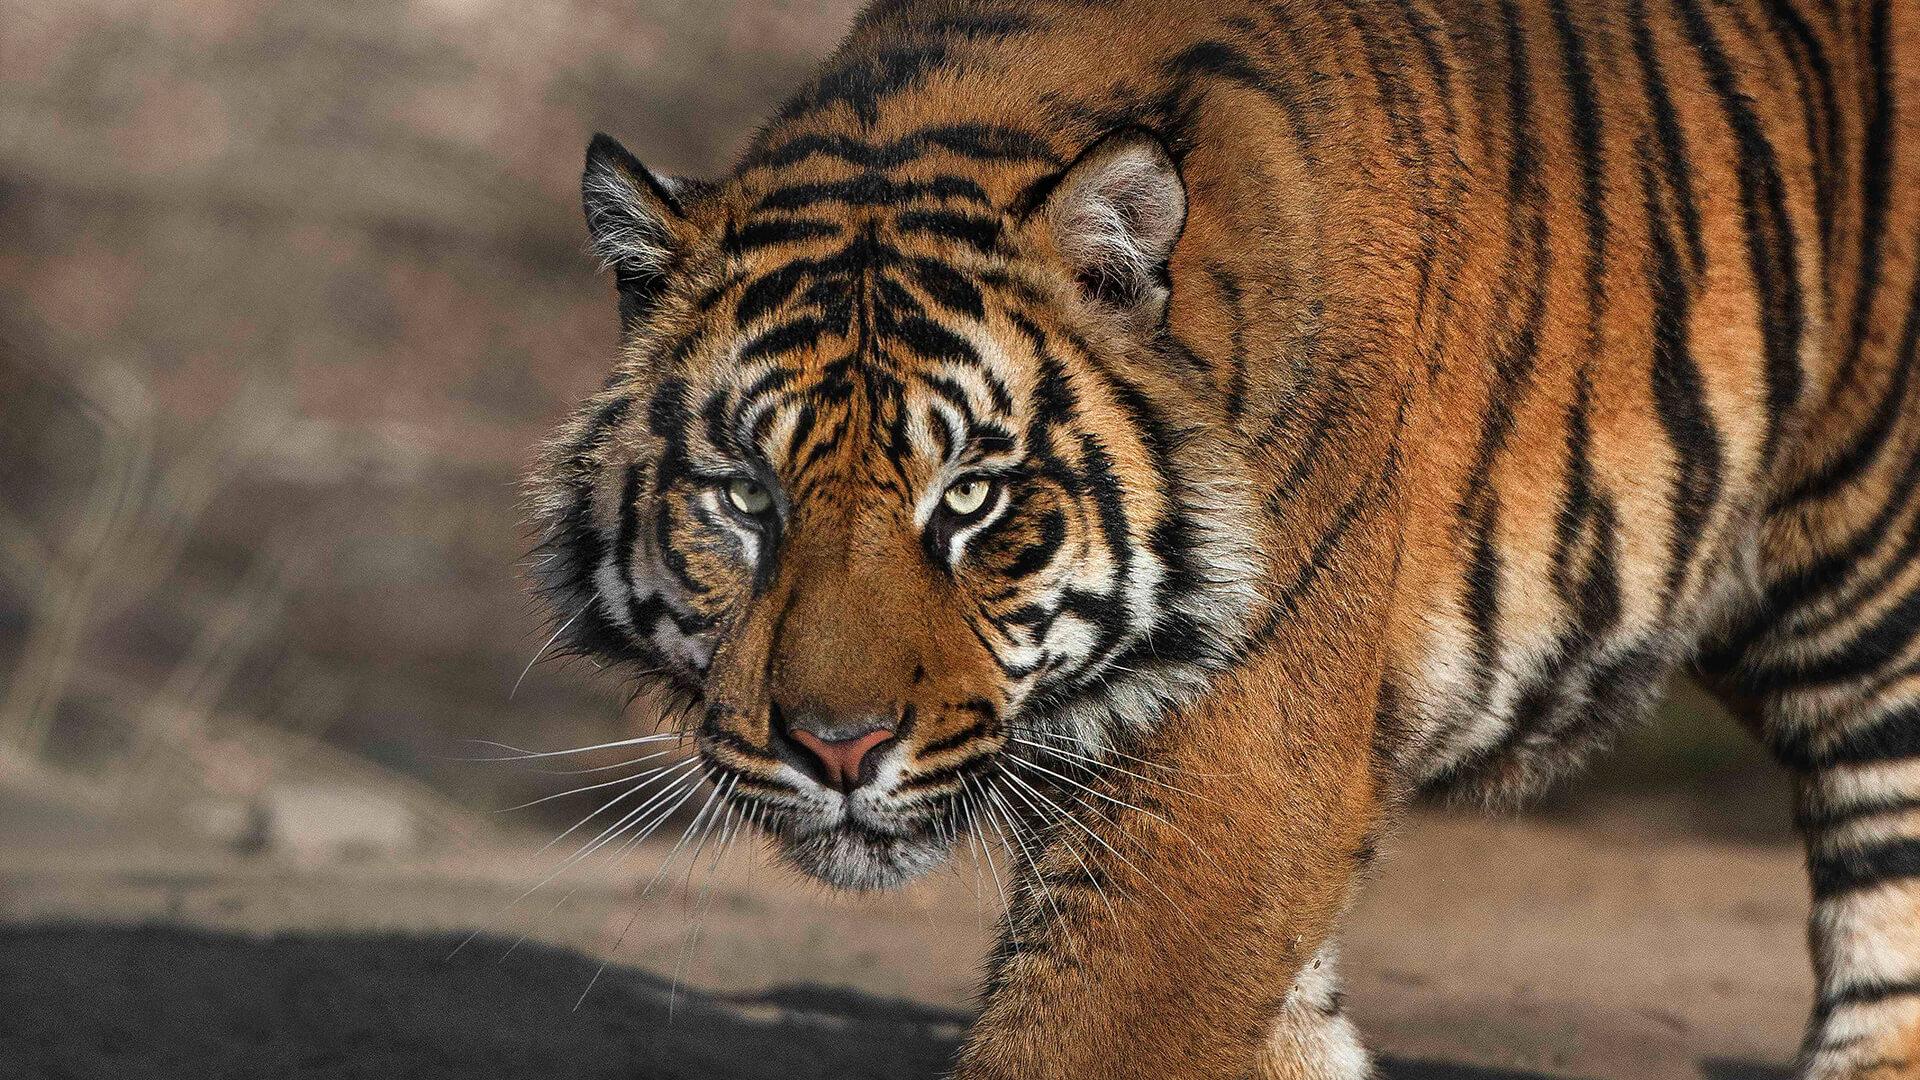 tiger | san diego zoo animals & plants